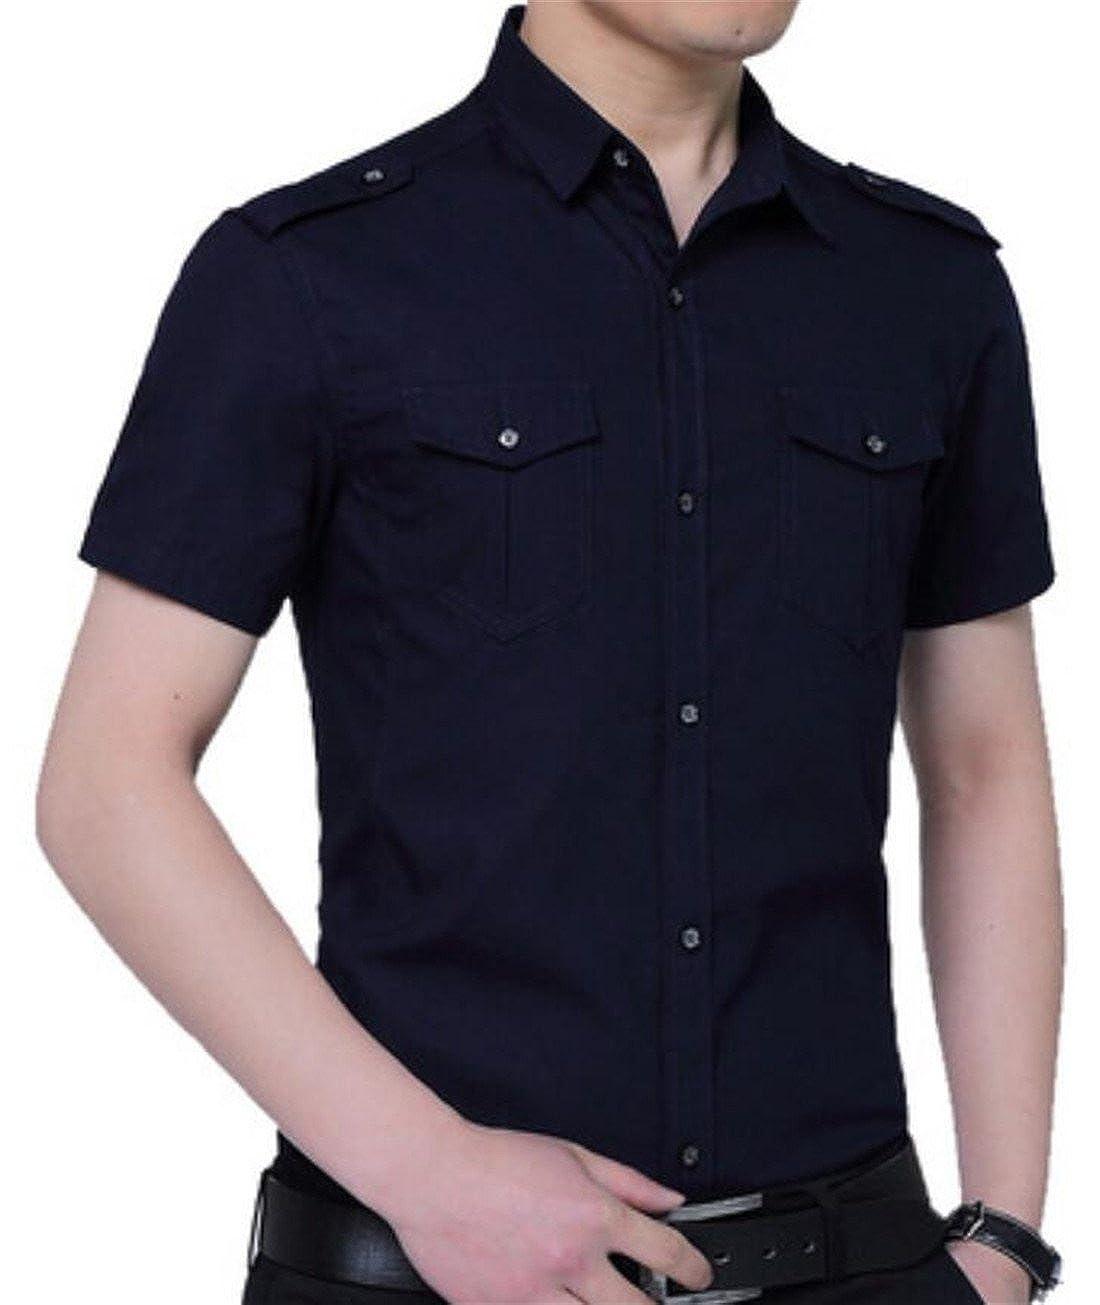 Nanquan Men NQ Mens Military Slim Fit Casual Cotton Short Sleeve Button Down Shirts